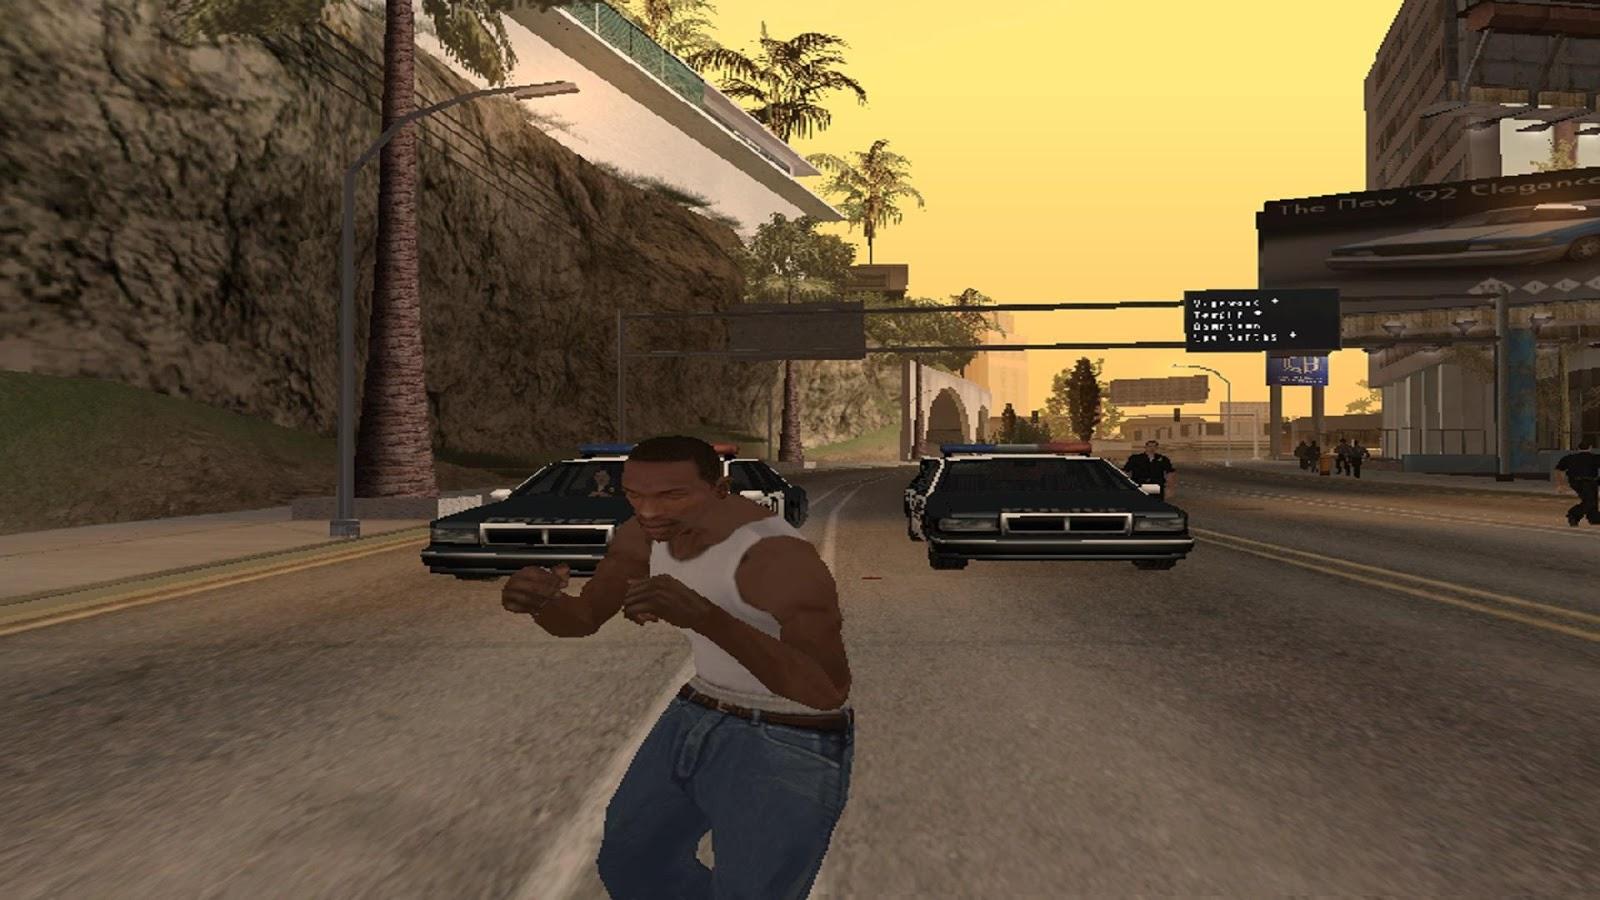 Grand Theft Scharfschütze: San Andreas android spiele download